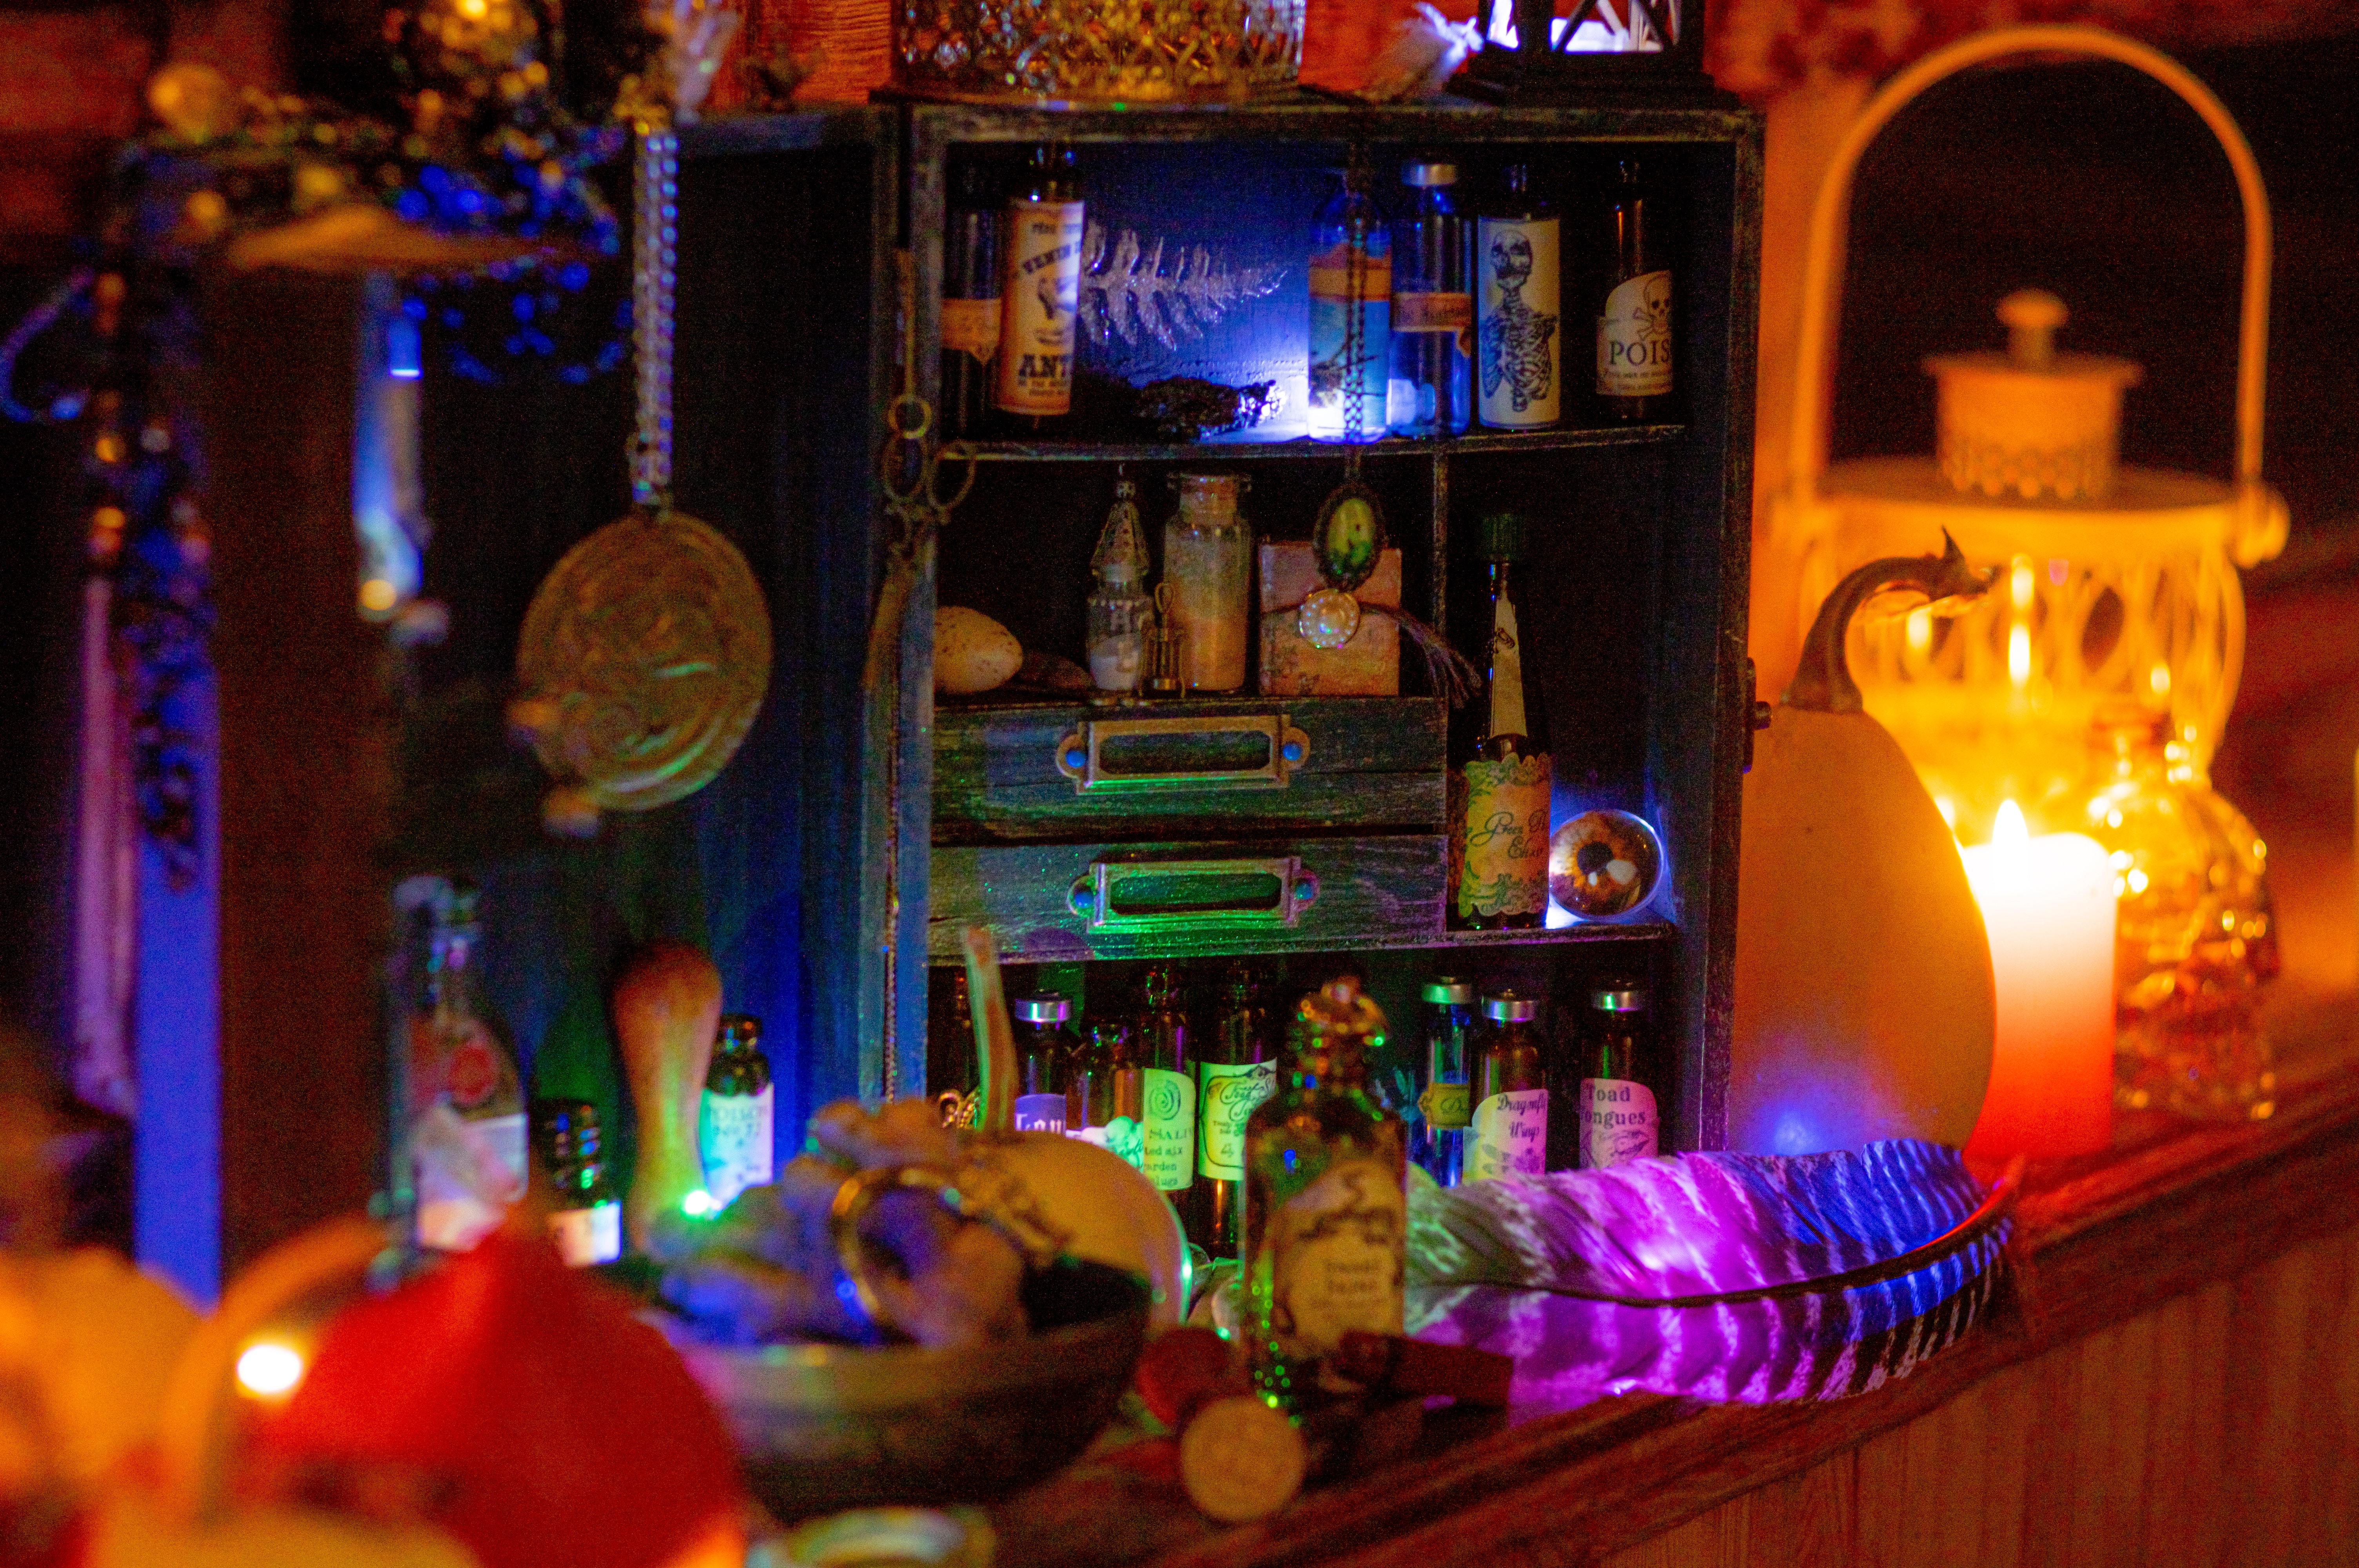 Europe, Experience, Halloween, Pumpkin, Festival, Spooky, Autumn, Travel, LocalBini, BiniBlog, London, Harry Potter, Warner Bros, Cocktails